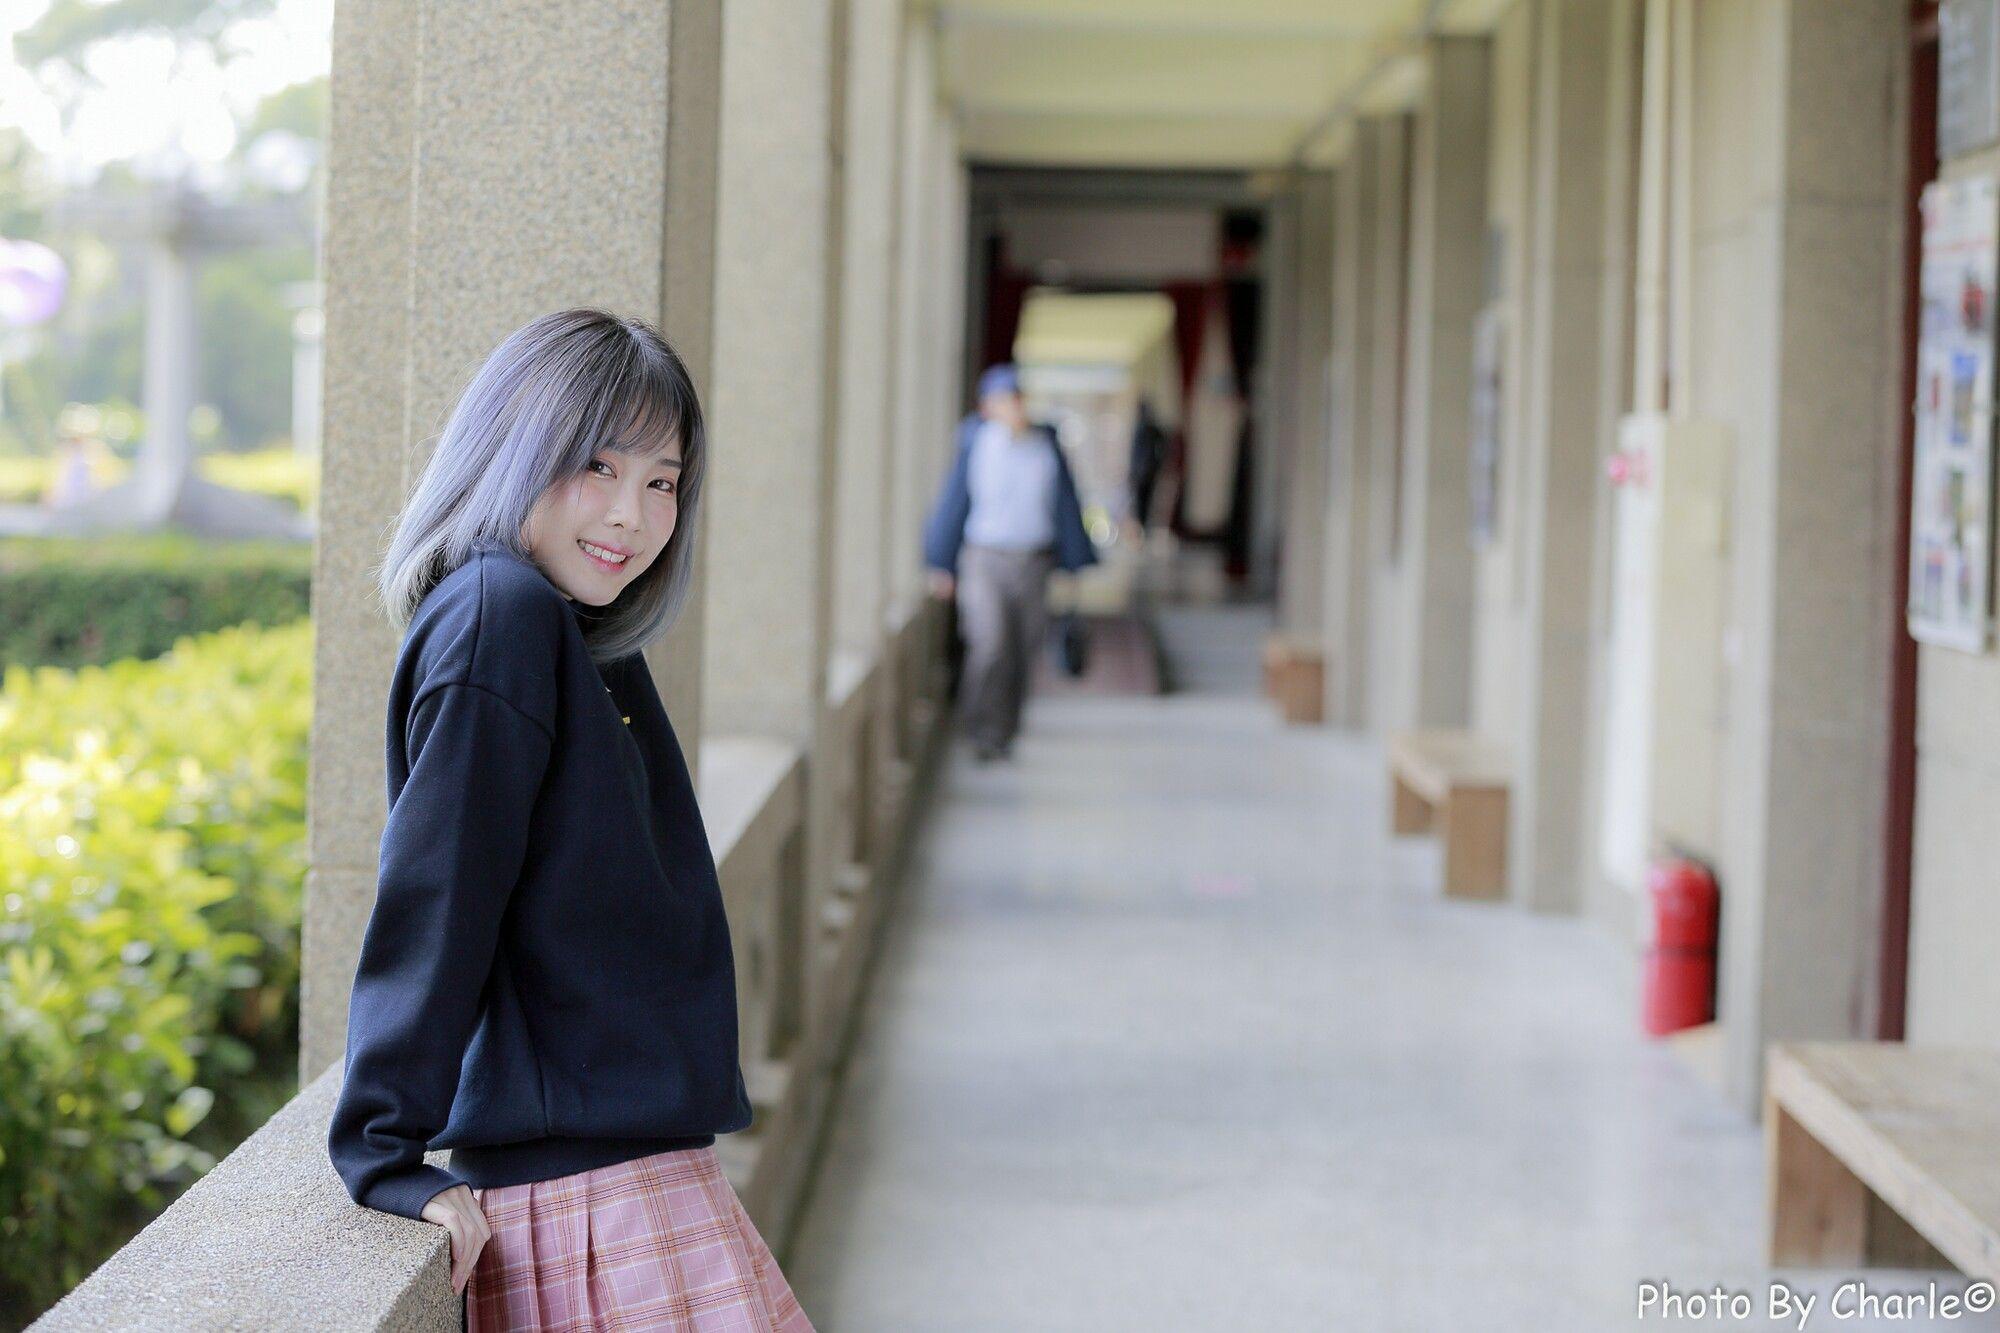 VOL.490 [台湾正妹]清纯唯美街拍少女:安妮兔超高清个人性感漂亮大图(108P)